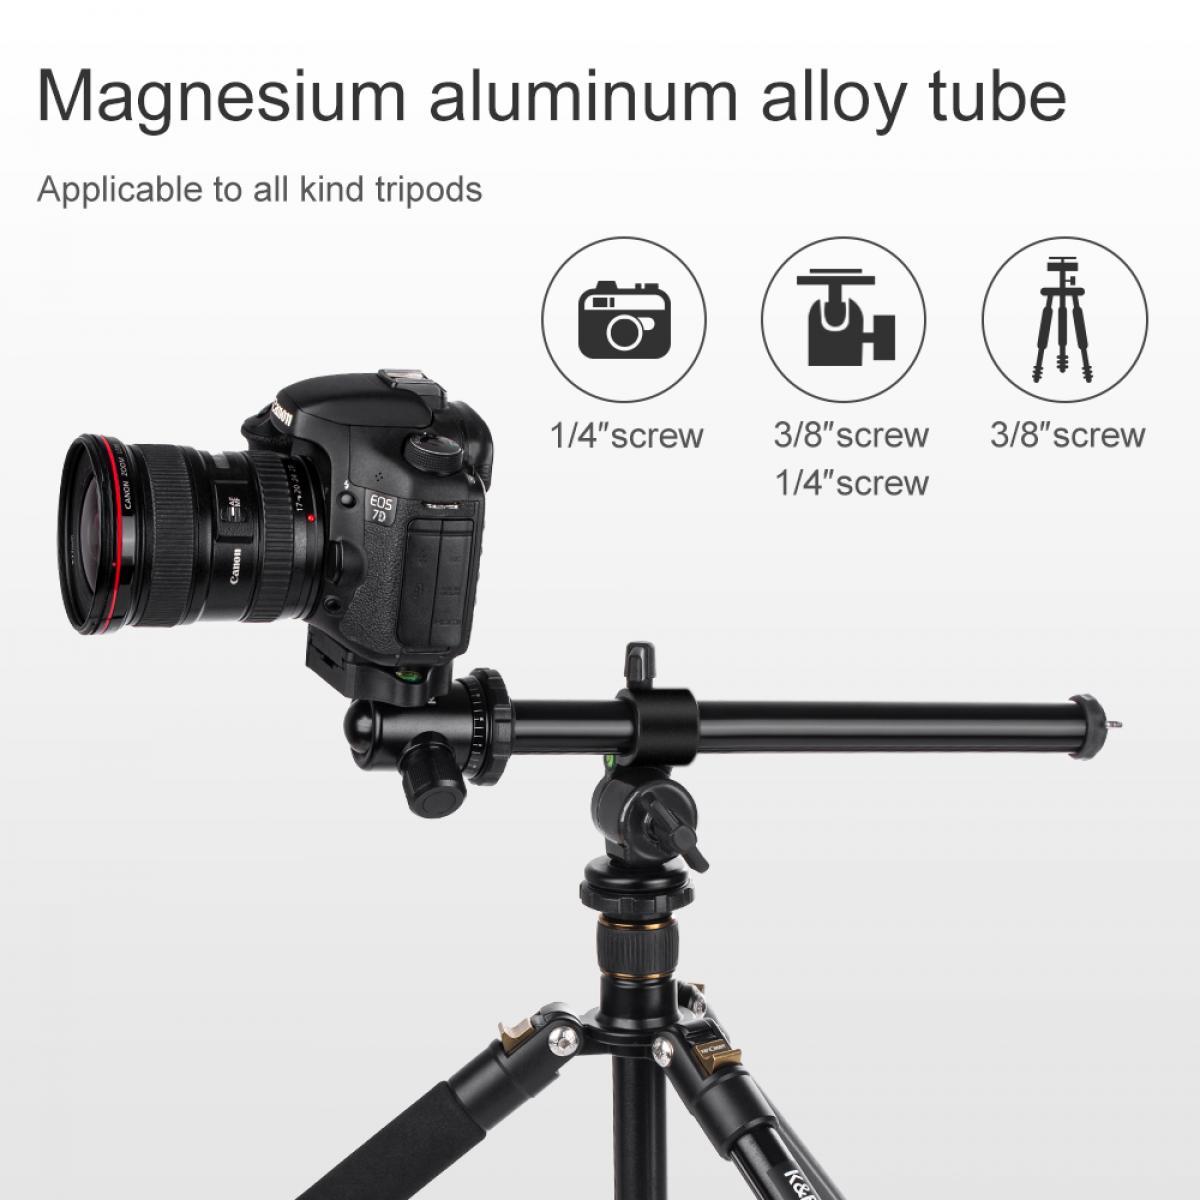 K&F Rotatable Multi-Angle Center Column For Camera Tripod Magnesium Alloy & Lock